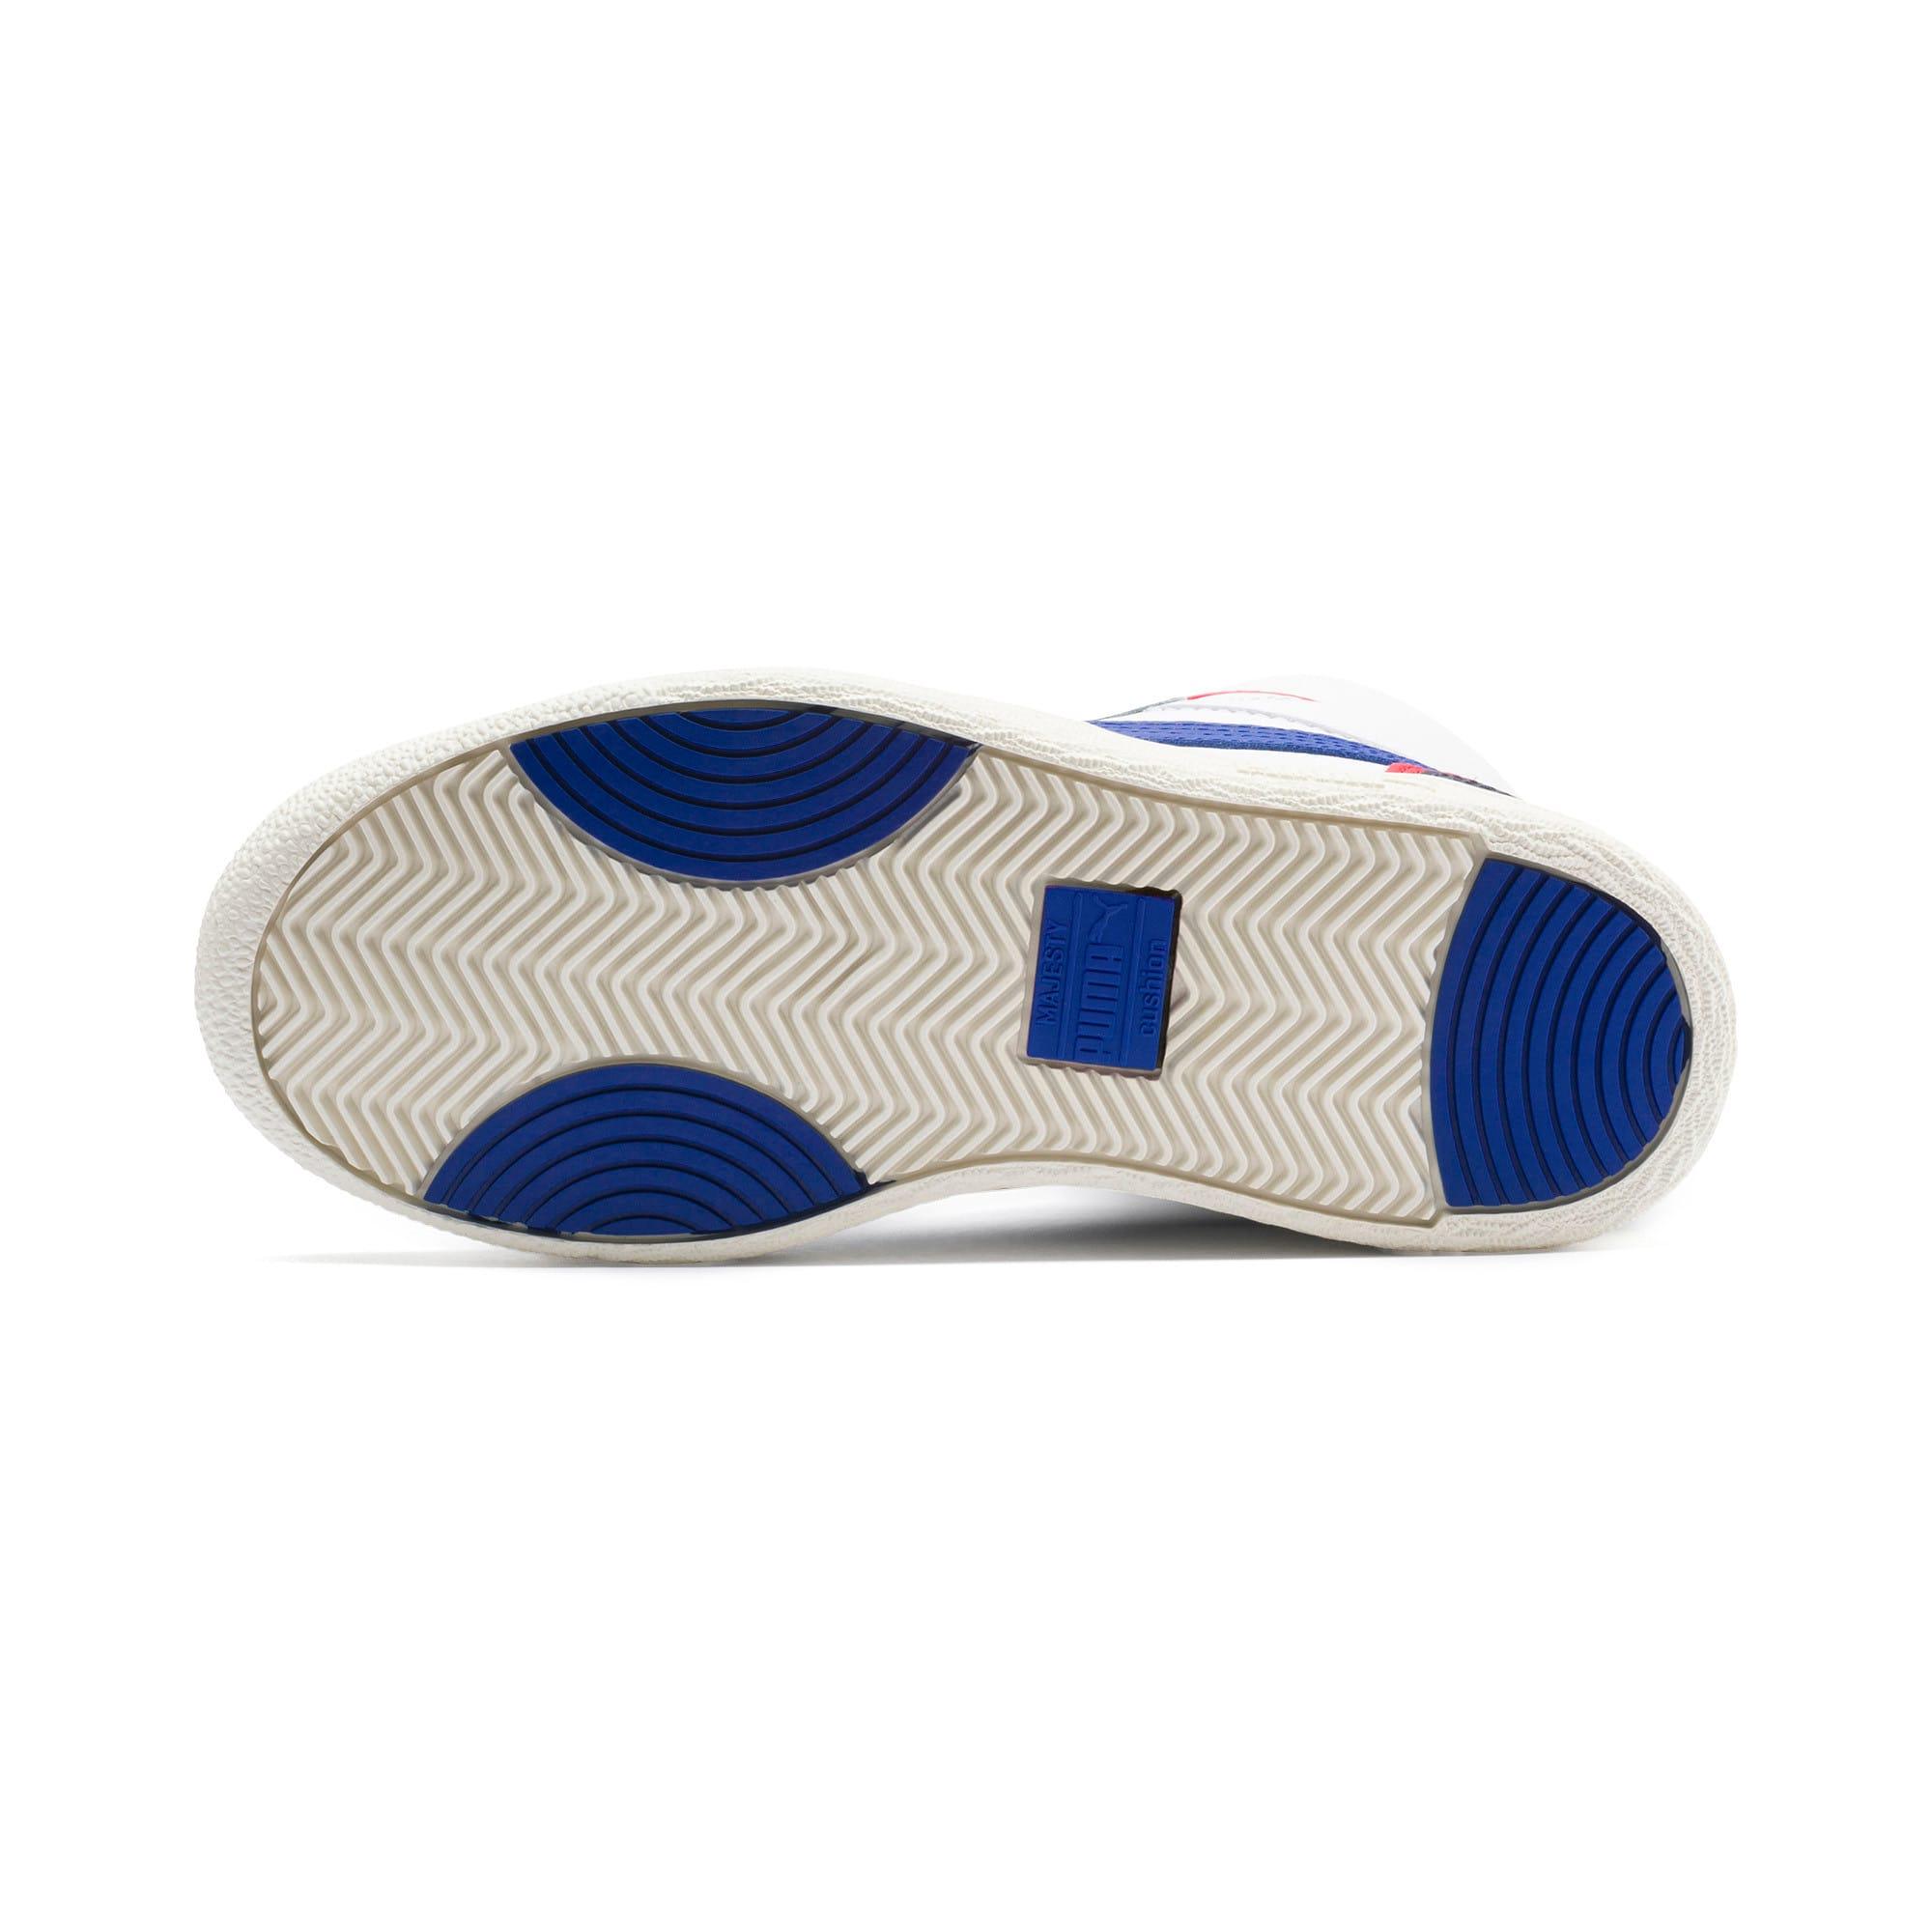 Thumbnail 4 of Ralph Sampson Mid Sneakers JR, White-SurfTheWeb-Marshmallow, medium